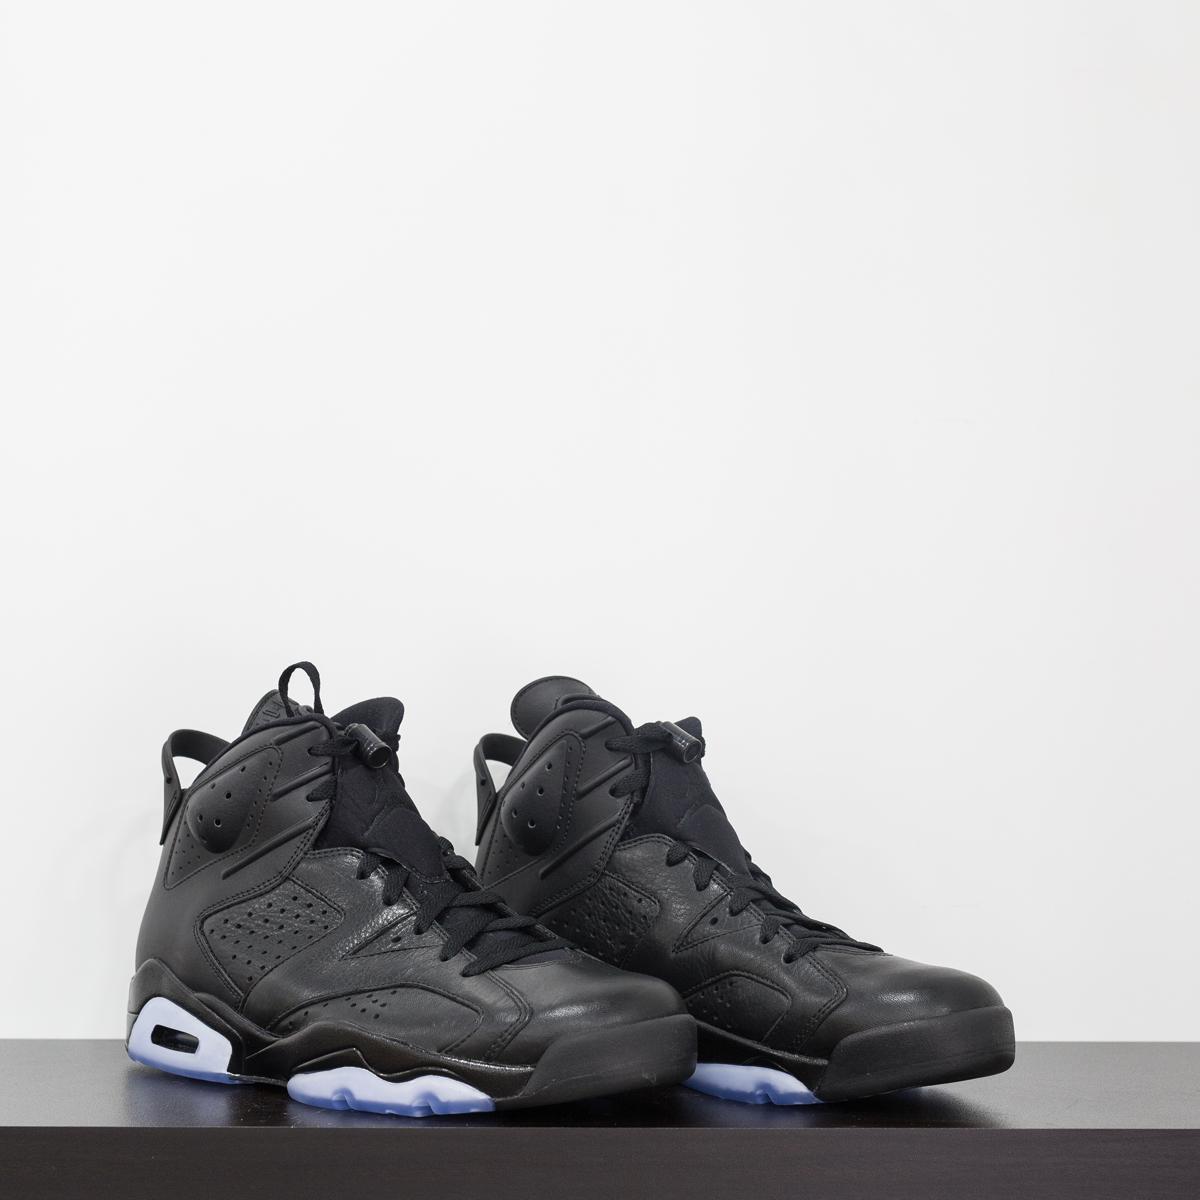 Kobe  Black Mamba Shoes